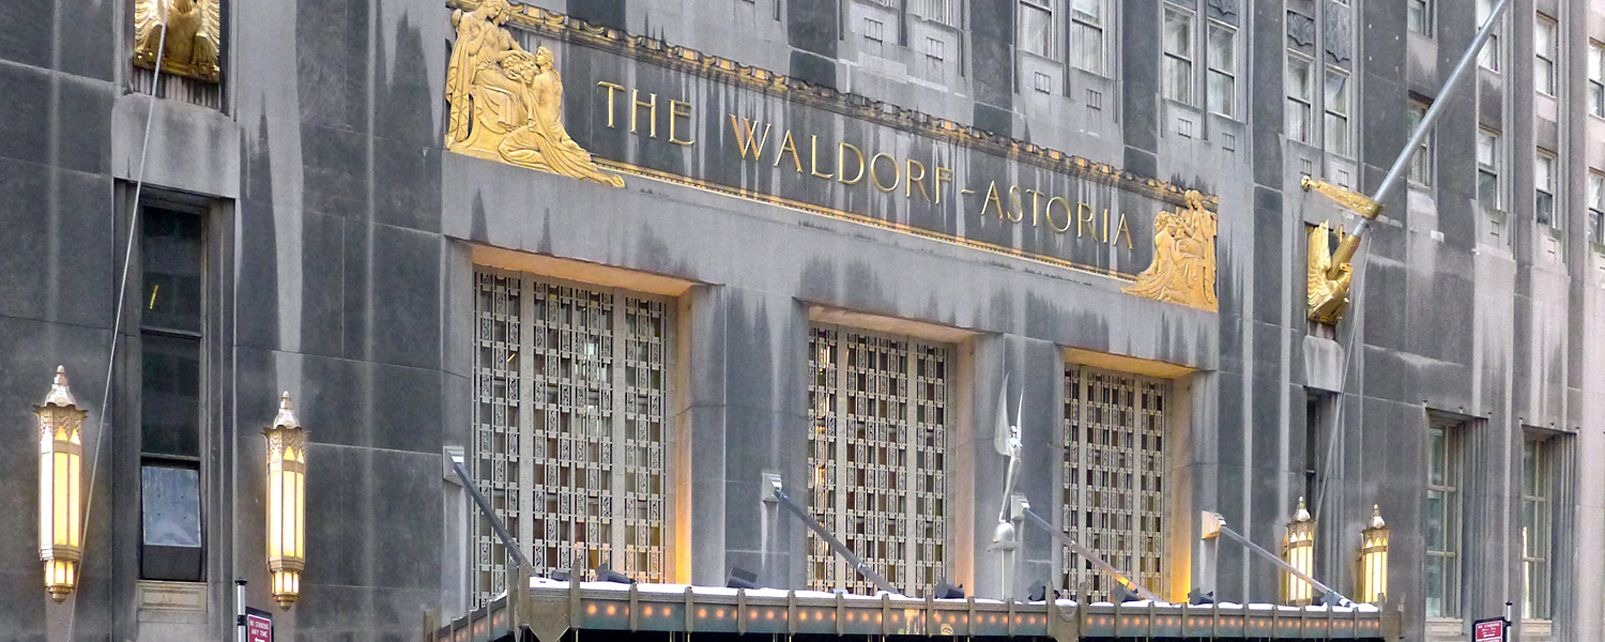 Hotel Waldorf Astoria In New York